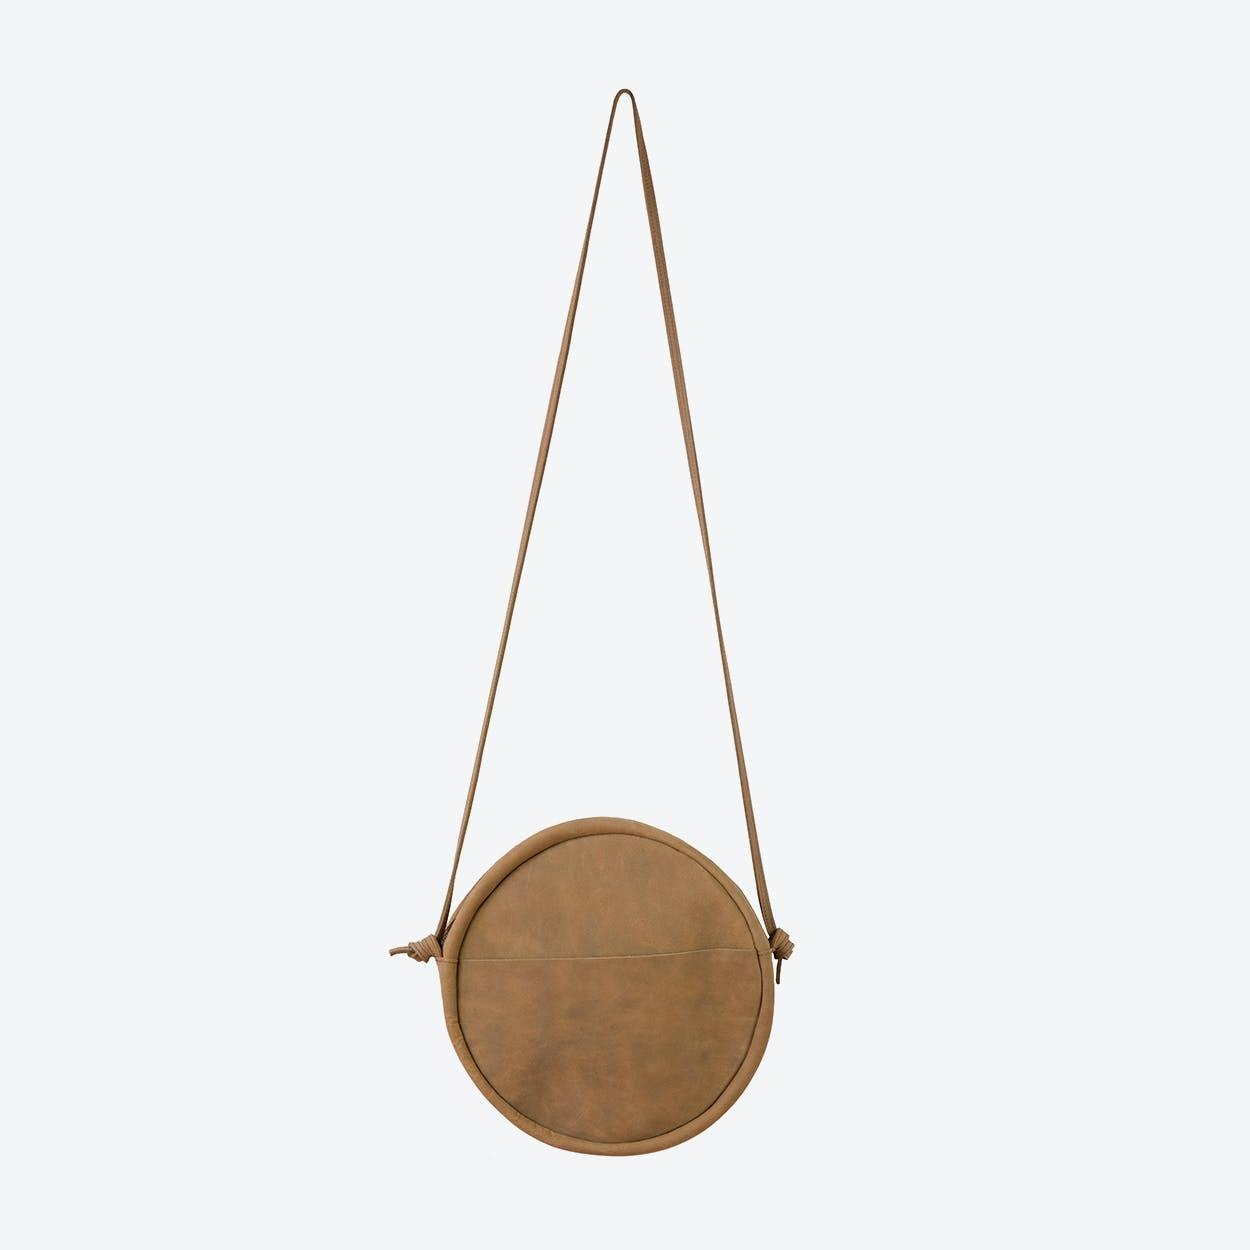 RUT Round Shoulder Bag in Brown